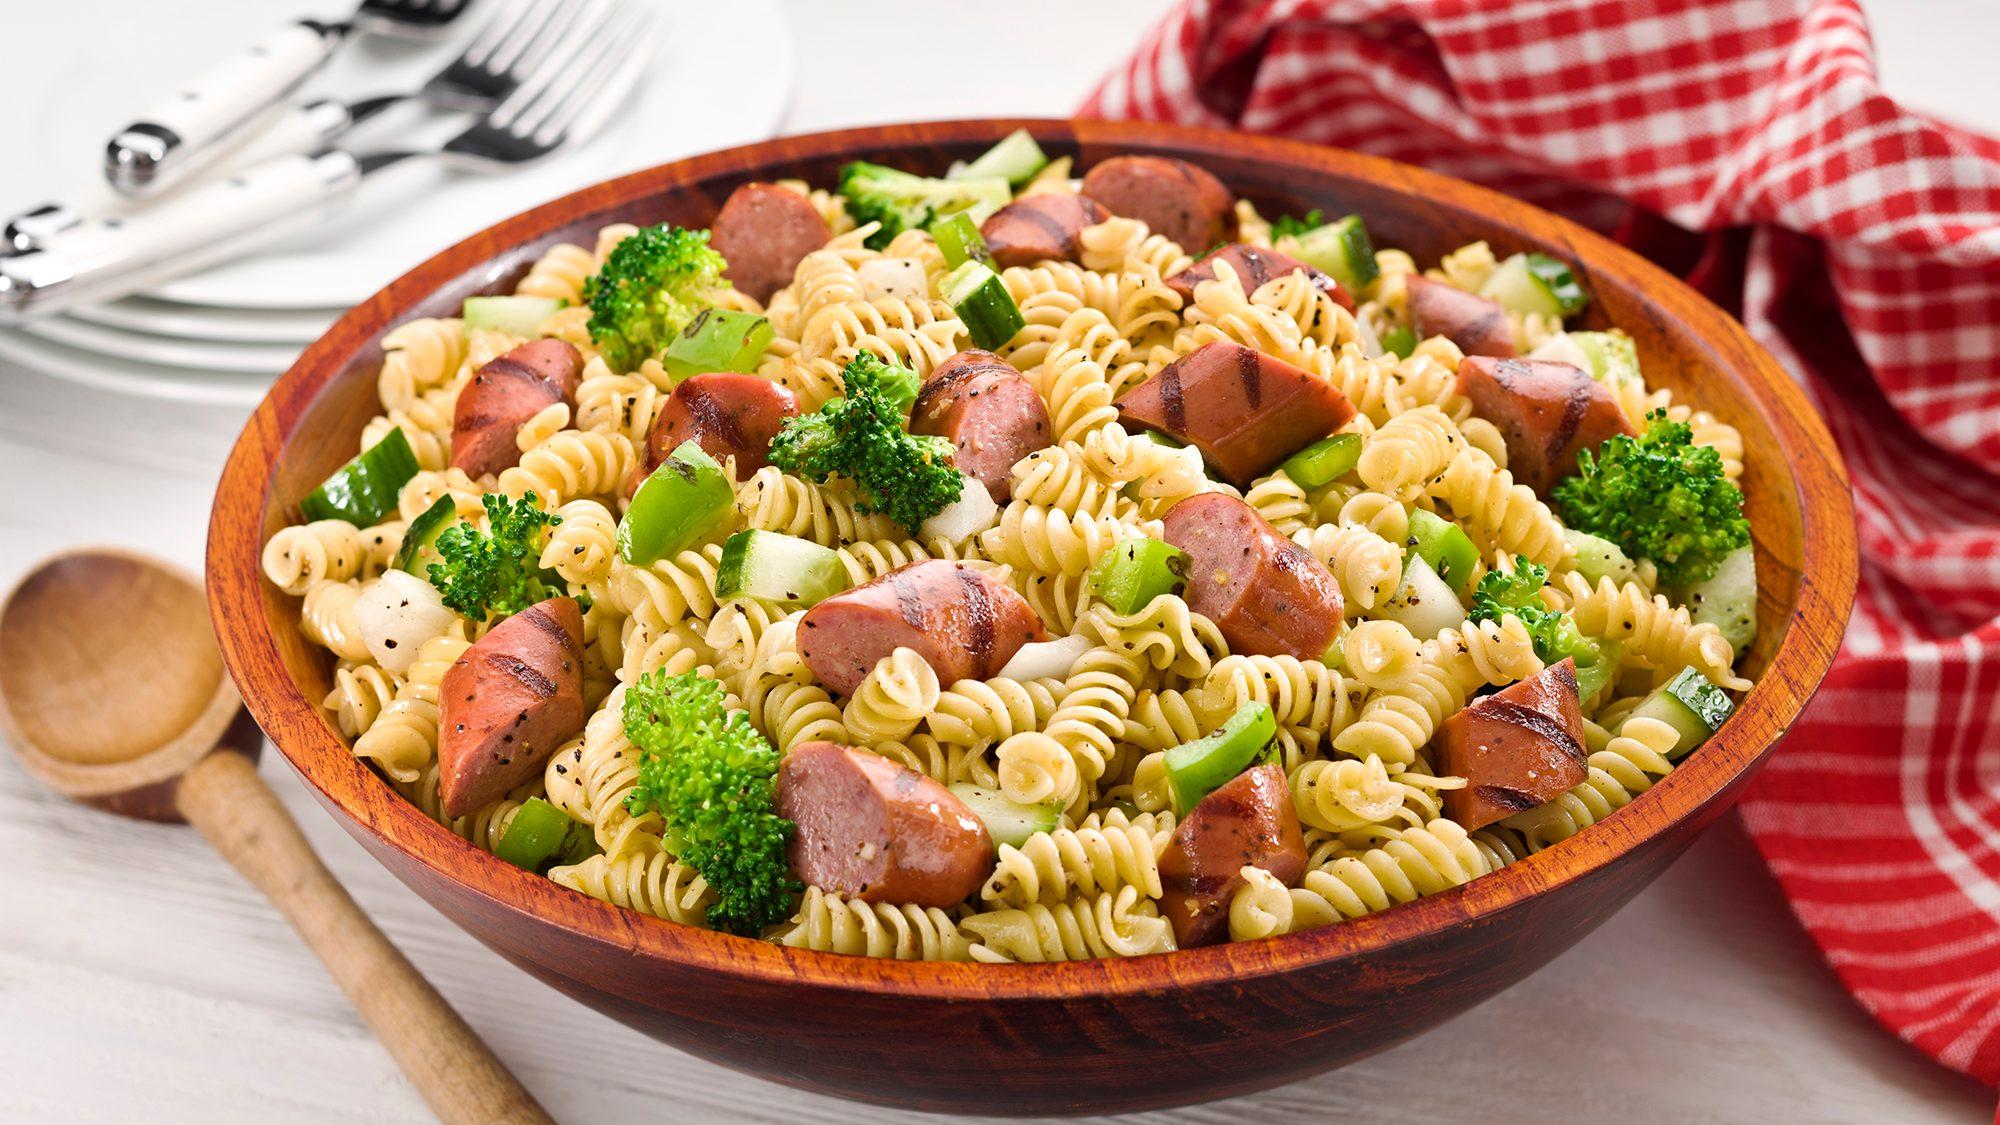 montreal-sausage-pasta-salad.jpg